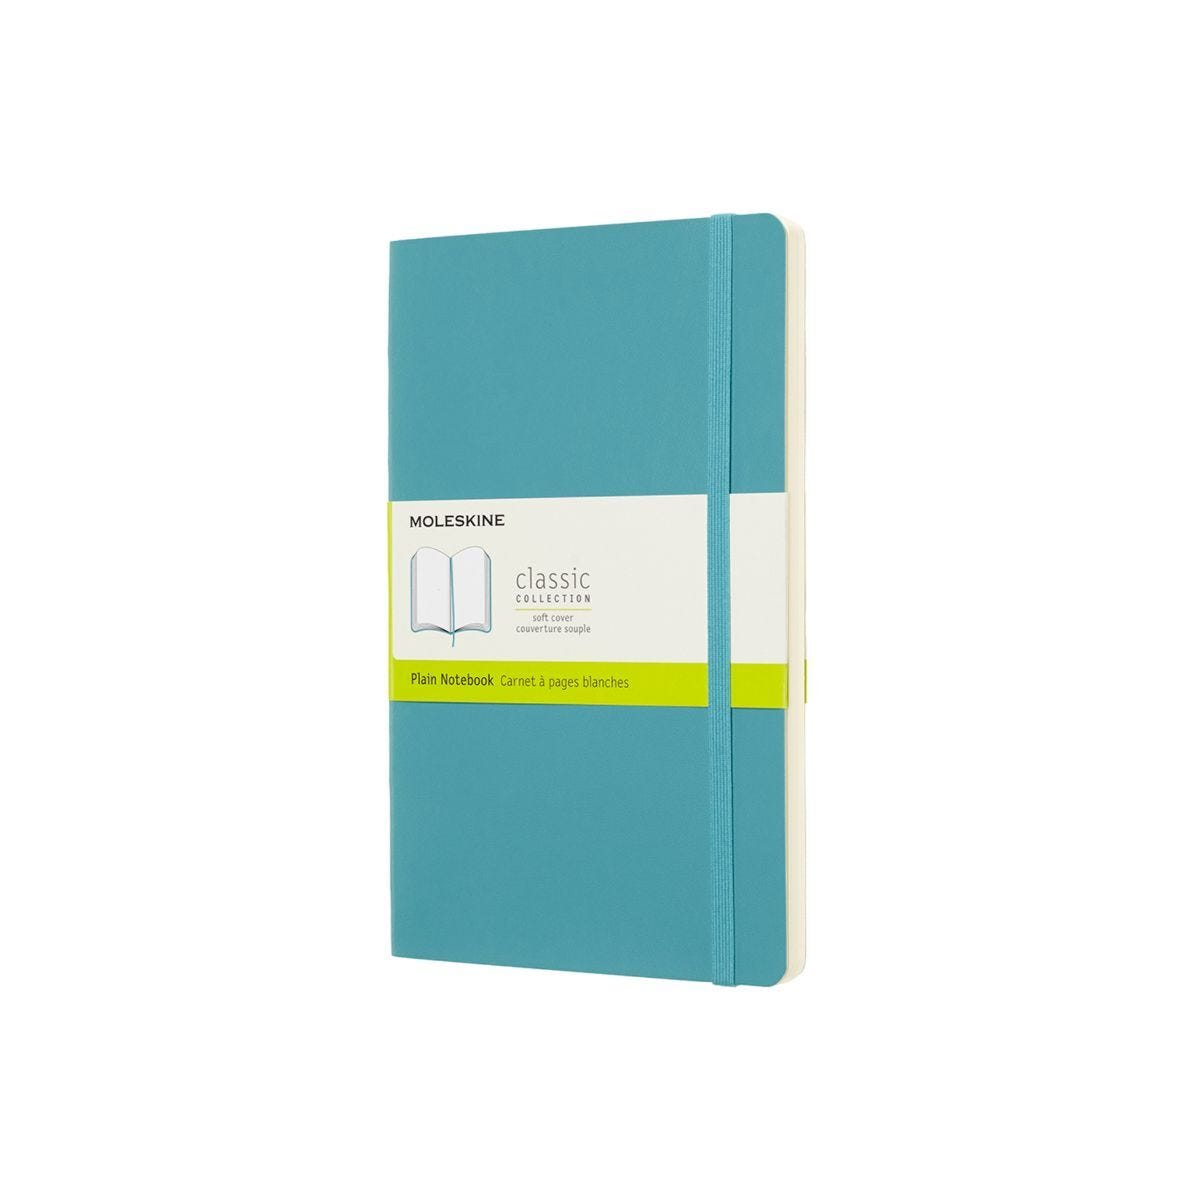 Moleskine Soft Cover Classic Notebook Large Plain Light Blue